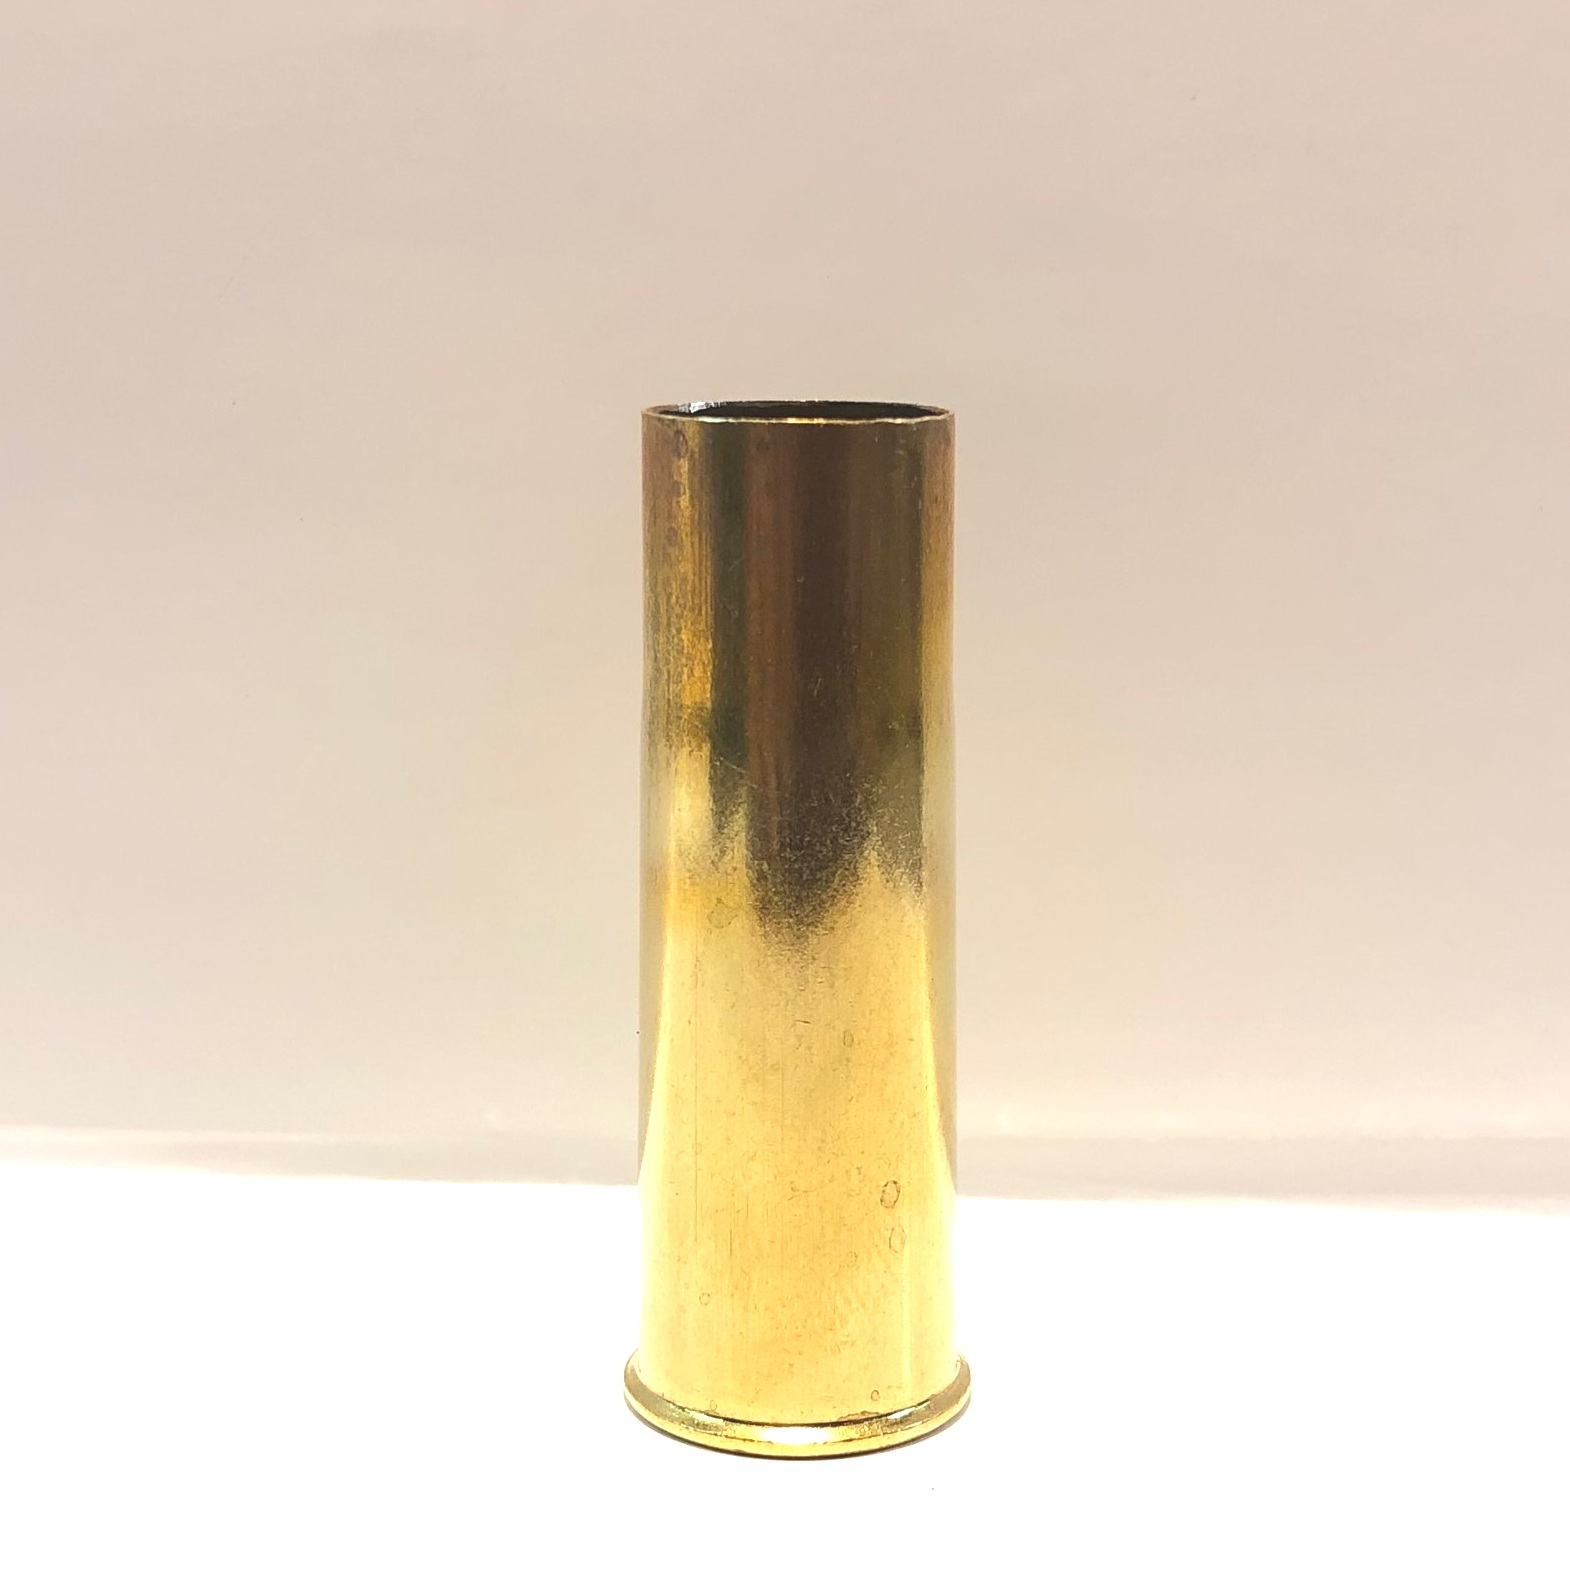 577 Snider Enfield (AmmunitionArtifacts)